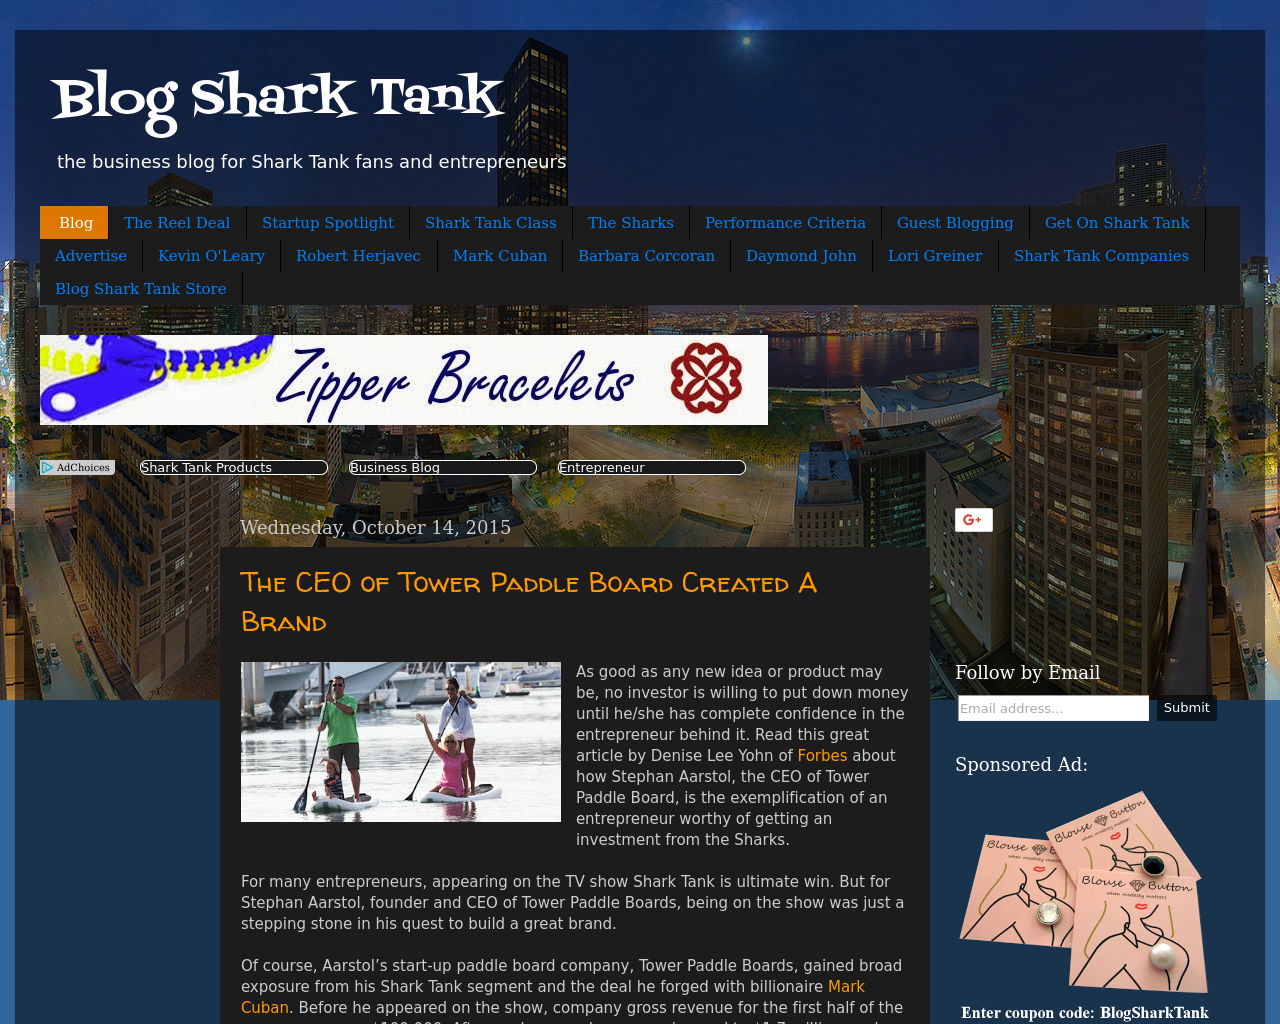 Blog-Shark-Tank-Advertising-Reviews-Pricing